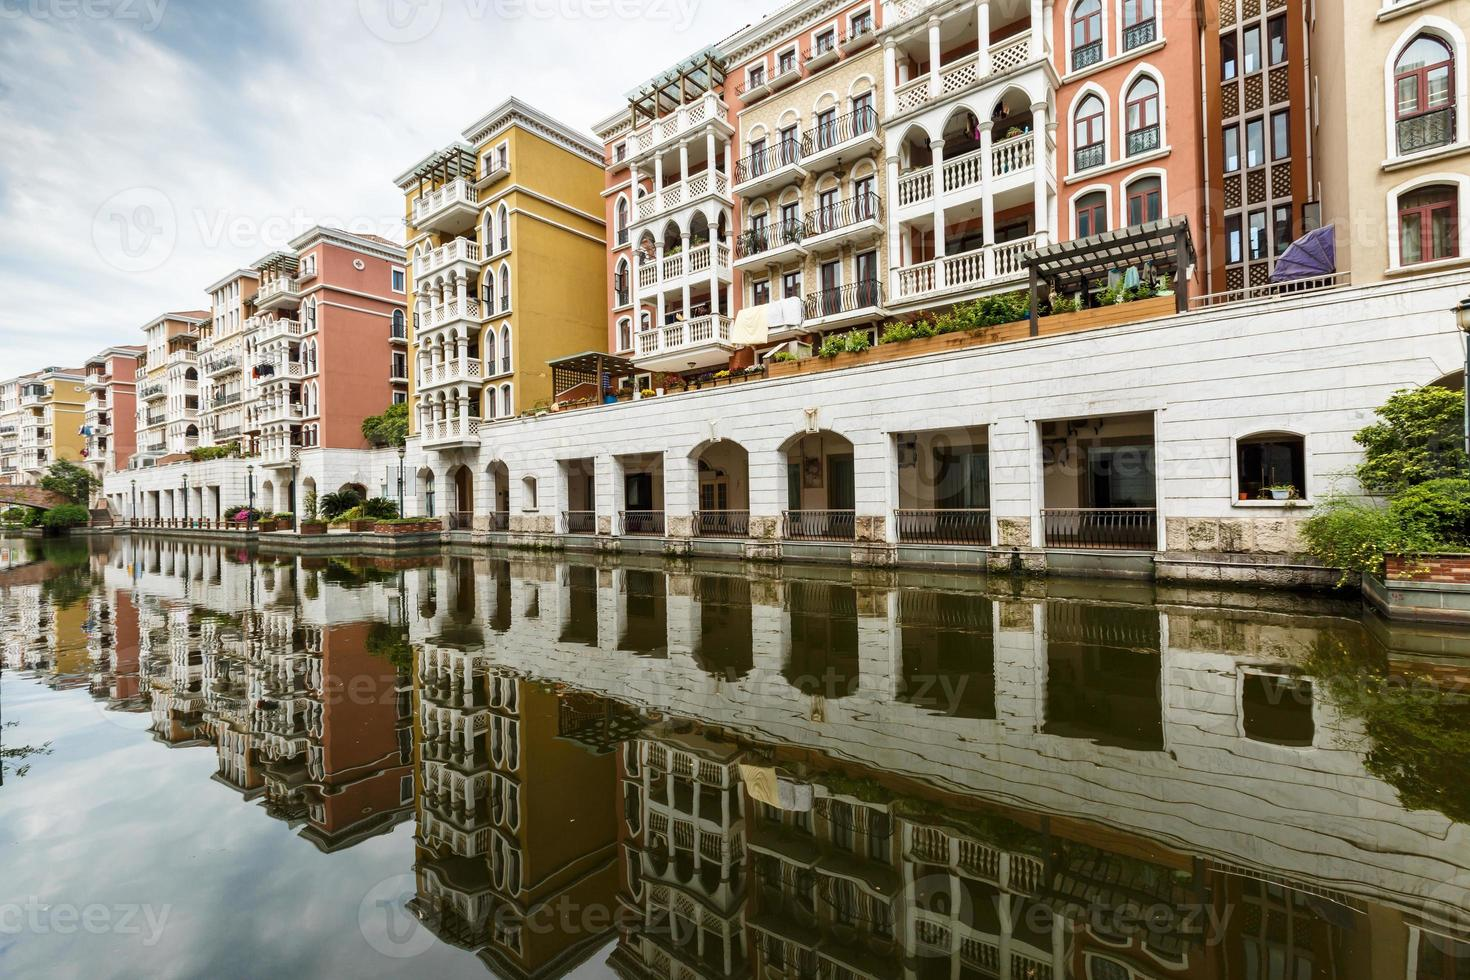 Suburban apartment buildings in hangzhou, China photo